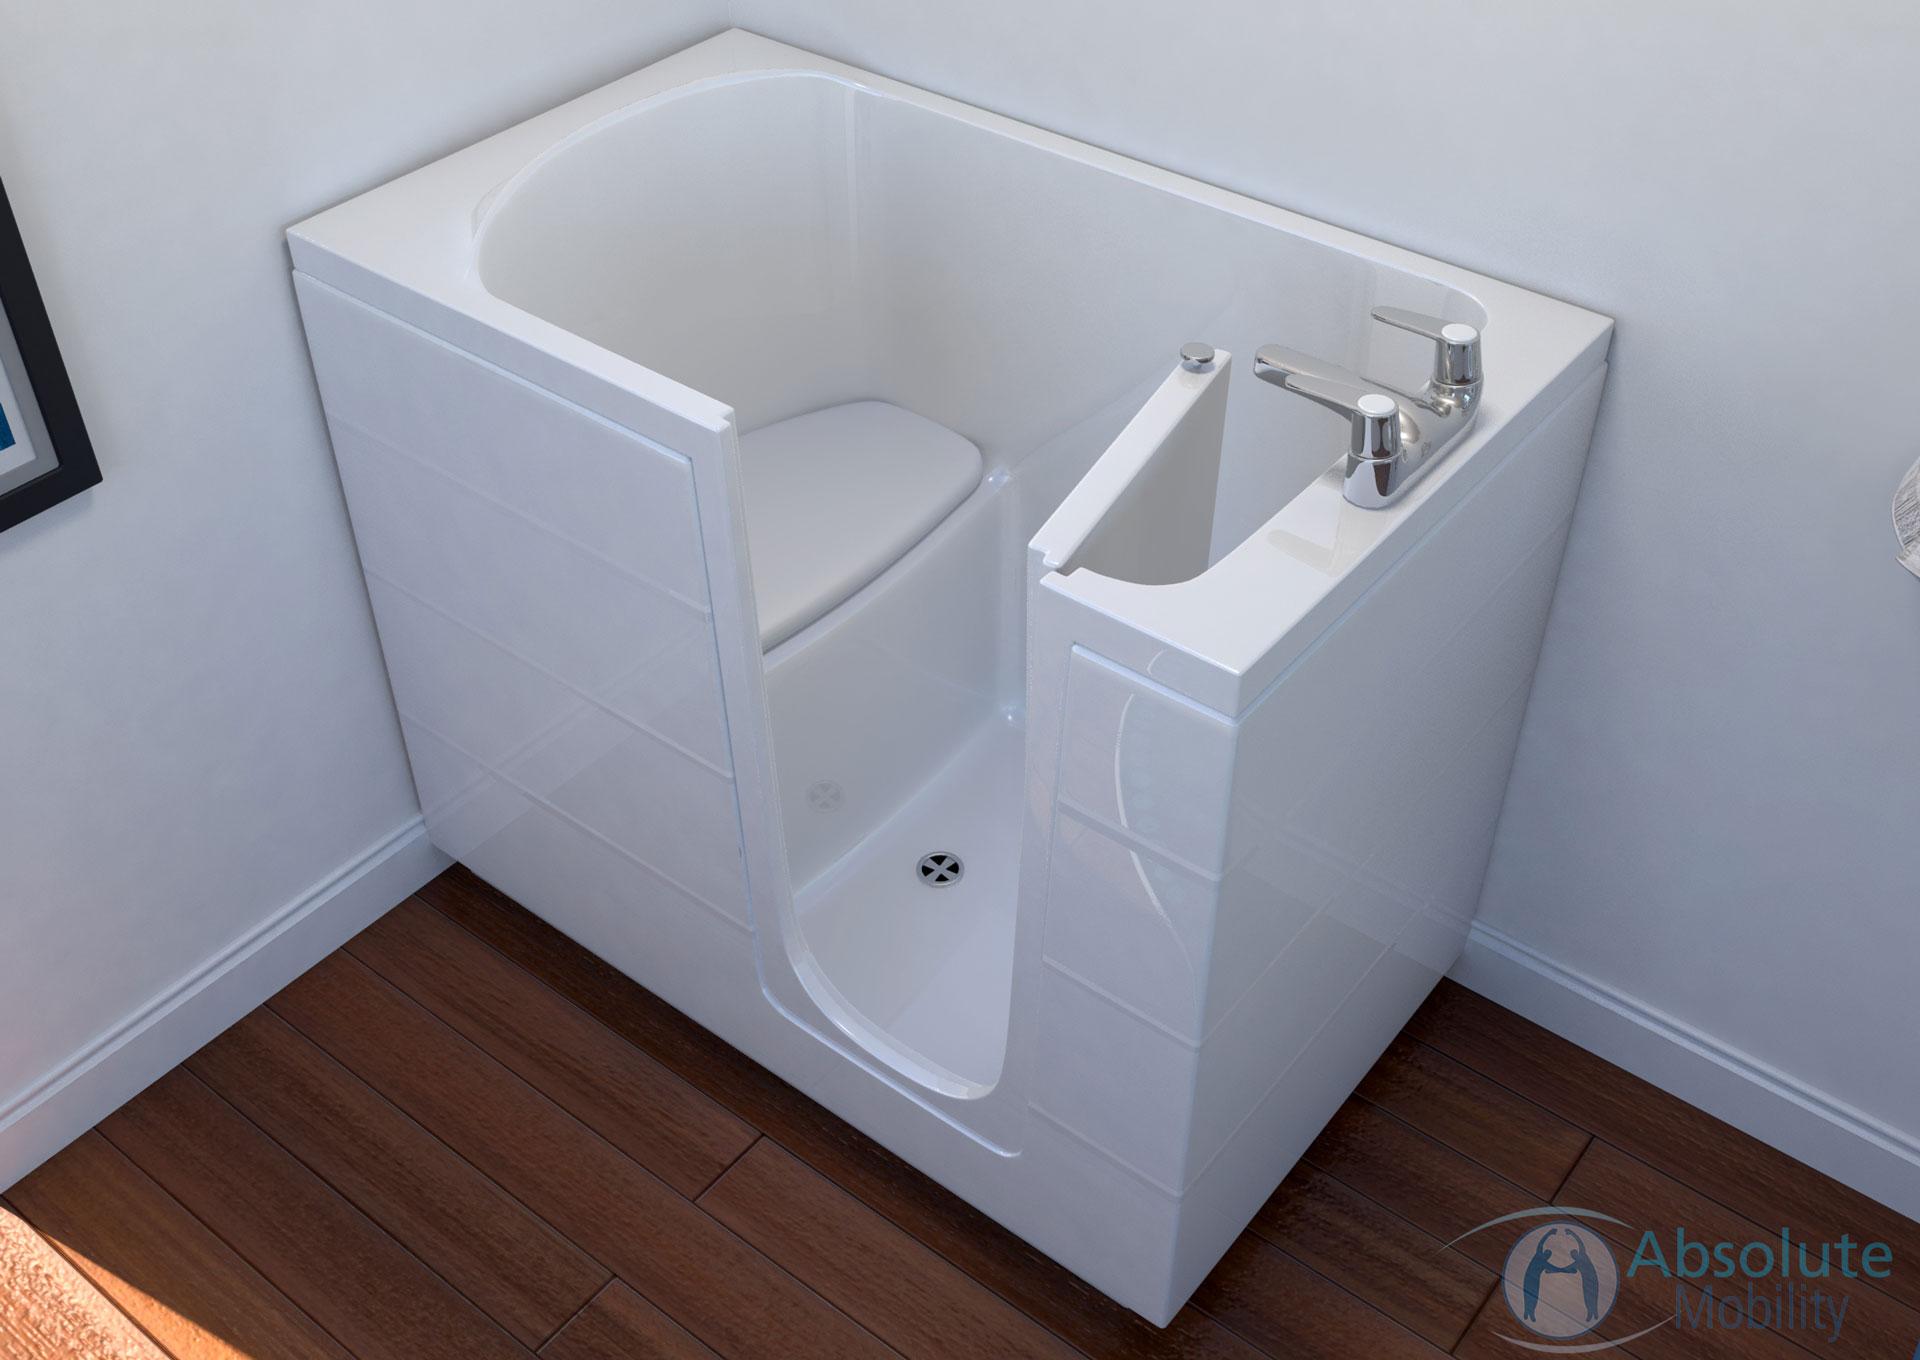 mobility bath CGI images for sales catalogue